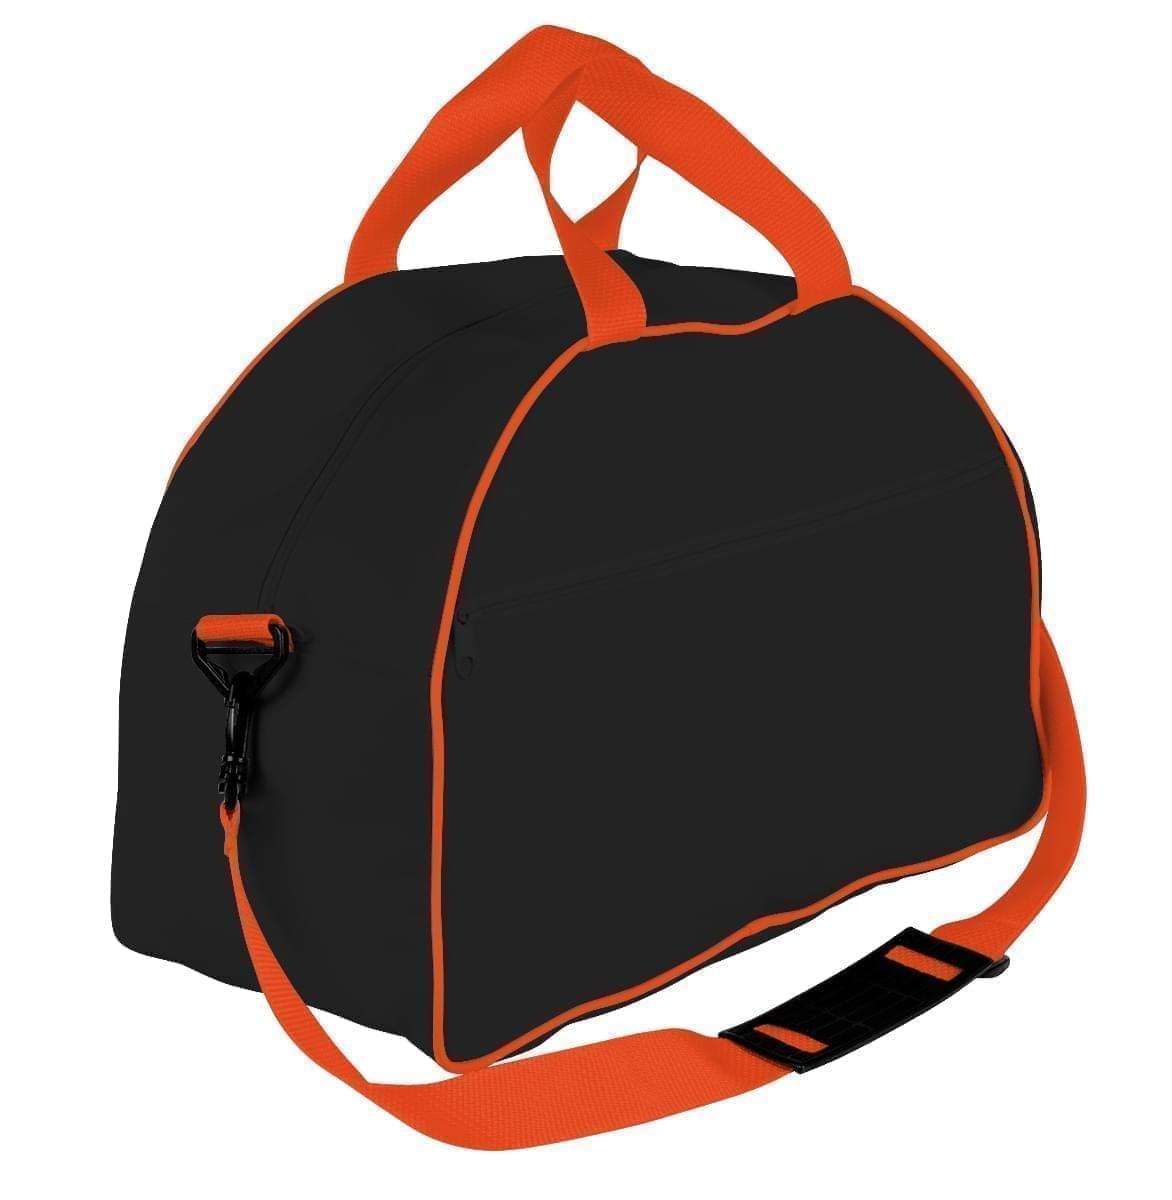 USA Made Nylon Poly Weekender Duffel Bags, Black-Orange, 6PKV32JAO0